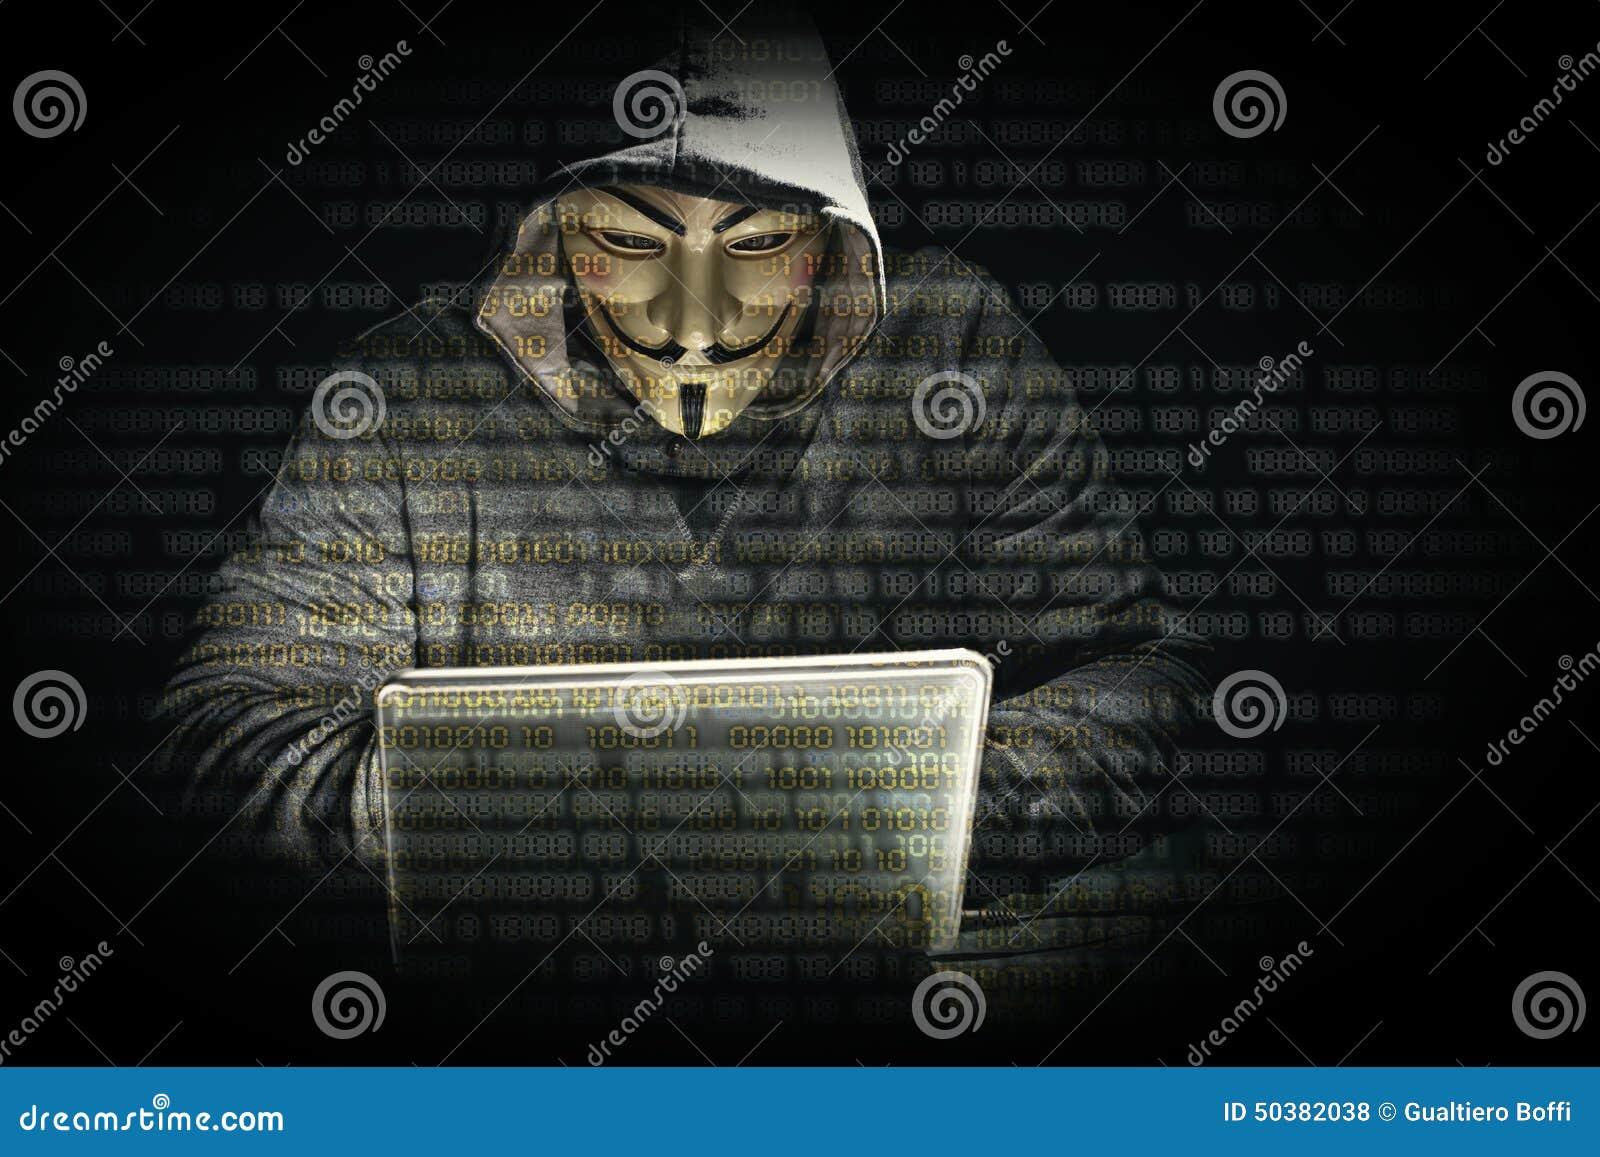 Hacker with mask edito...V For Vendetta Mask Vector